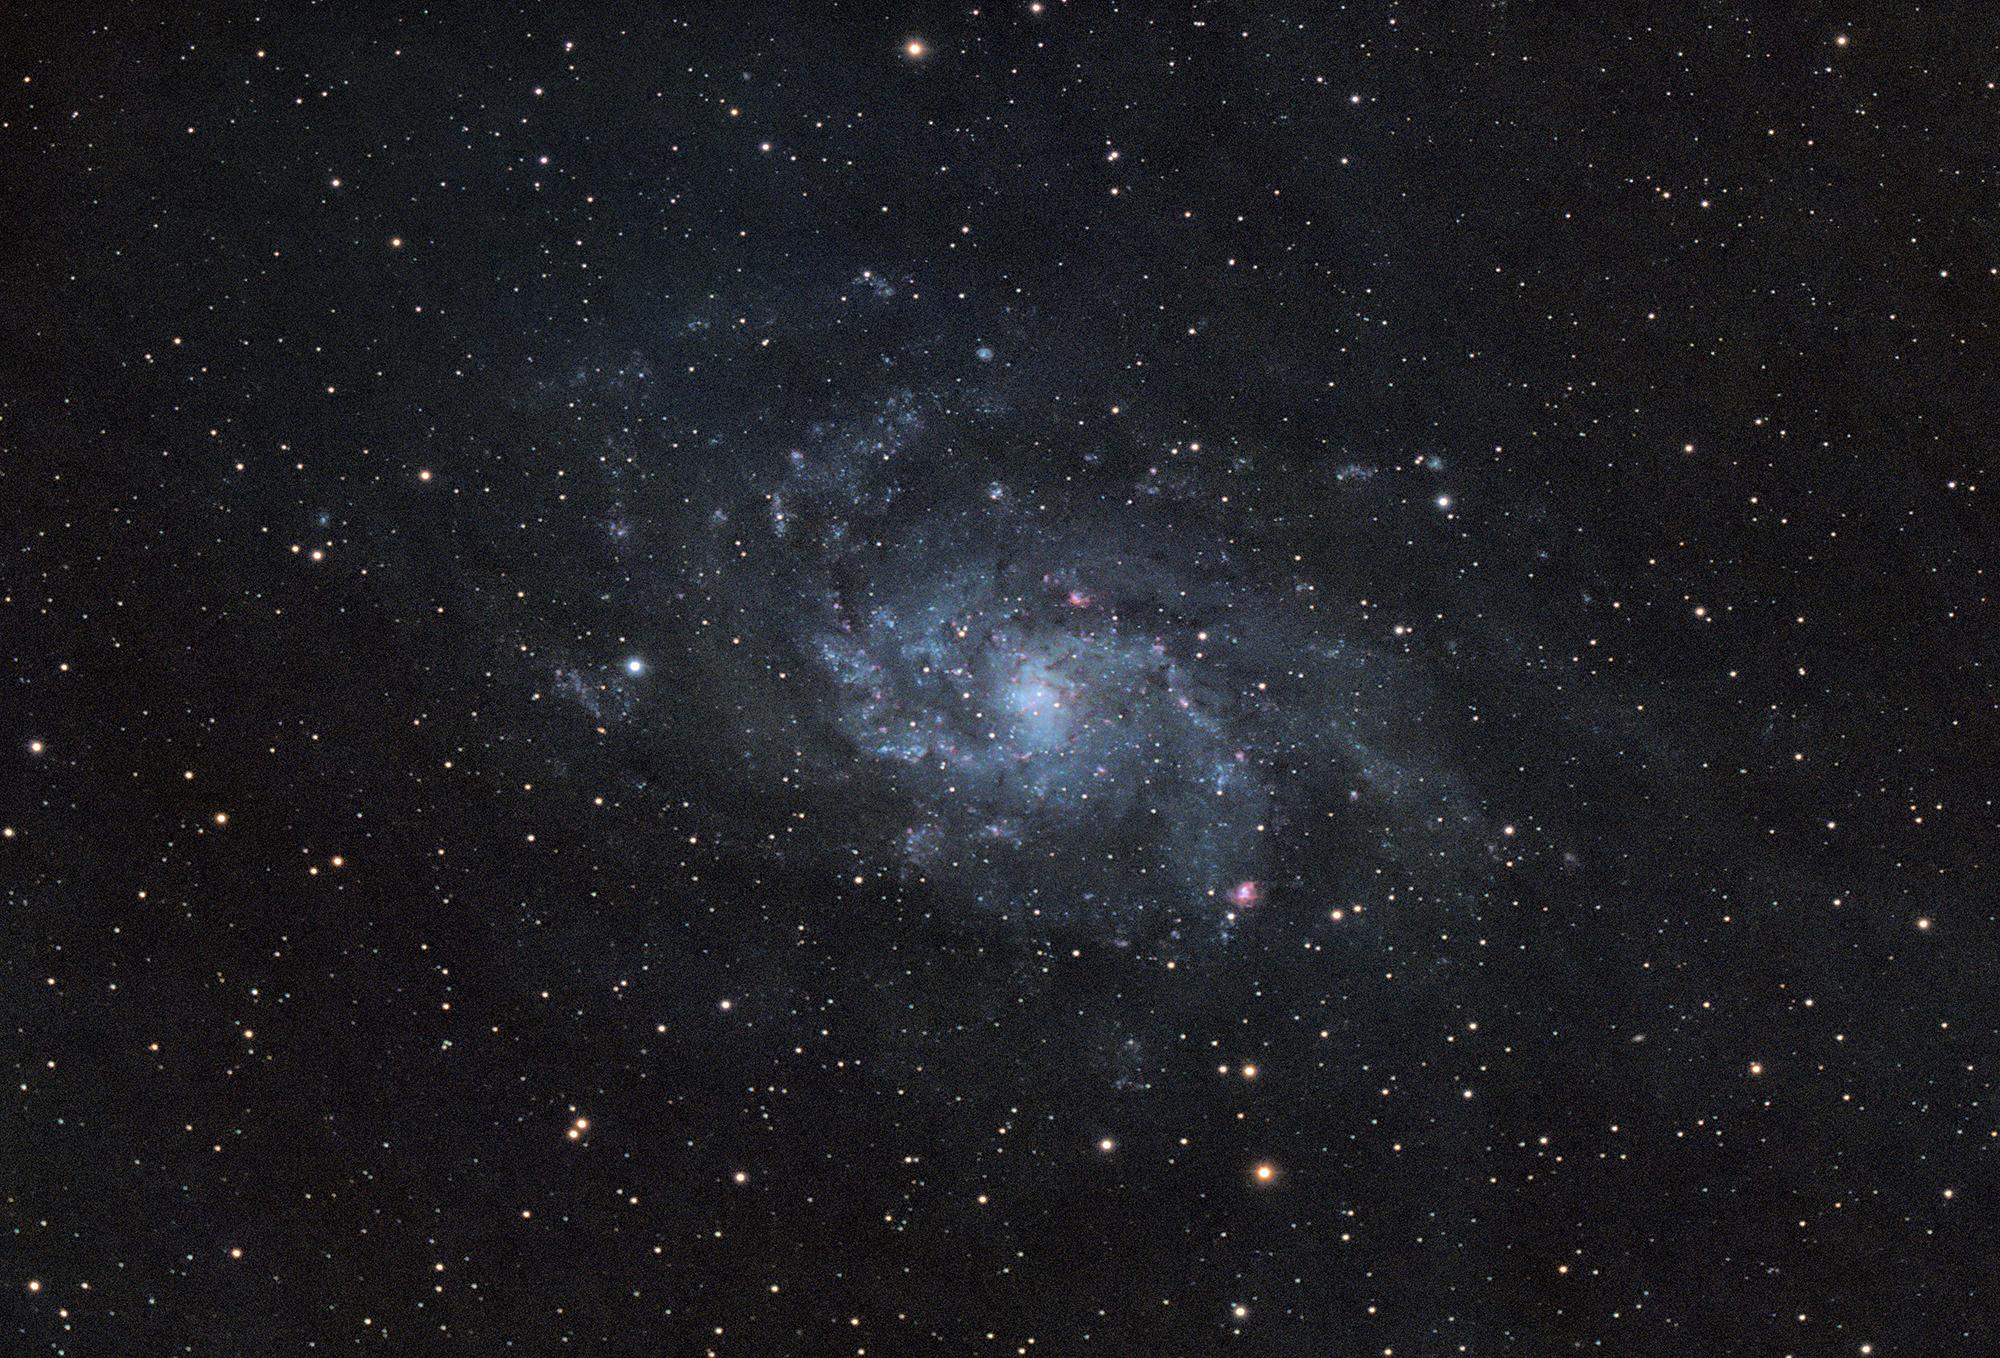 Rosette nebula captured with RASA8 and ASI183MC camera